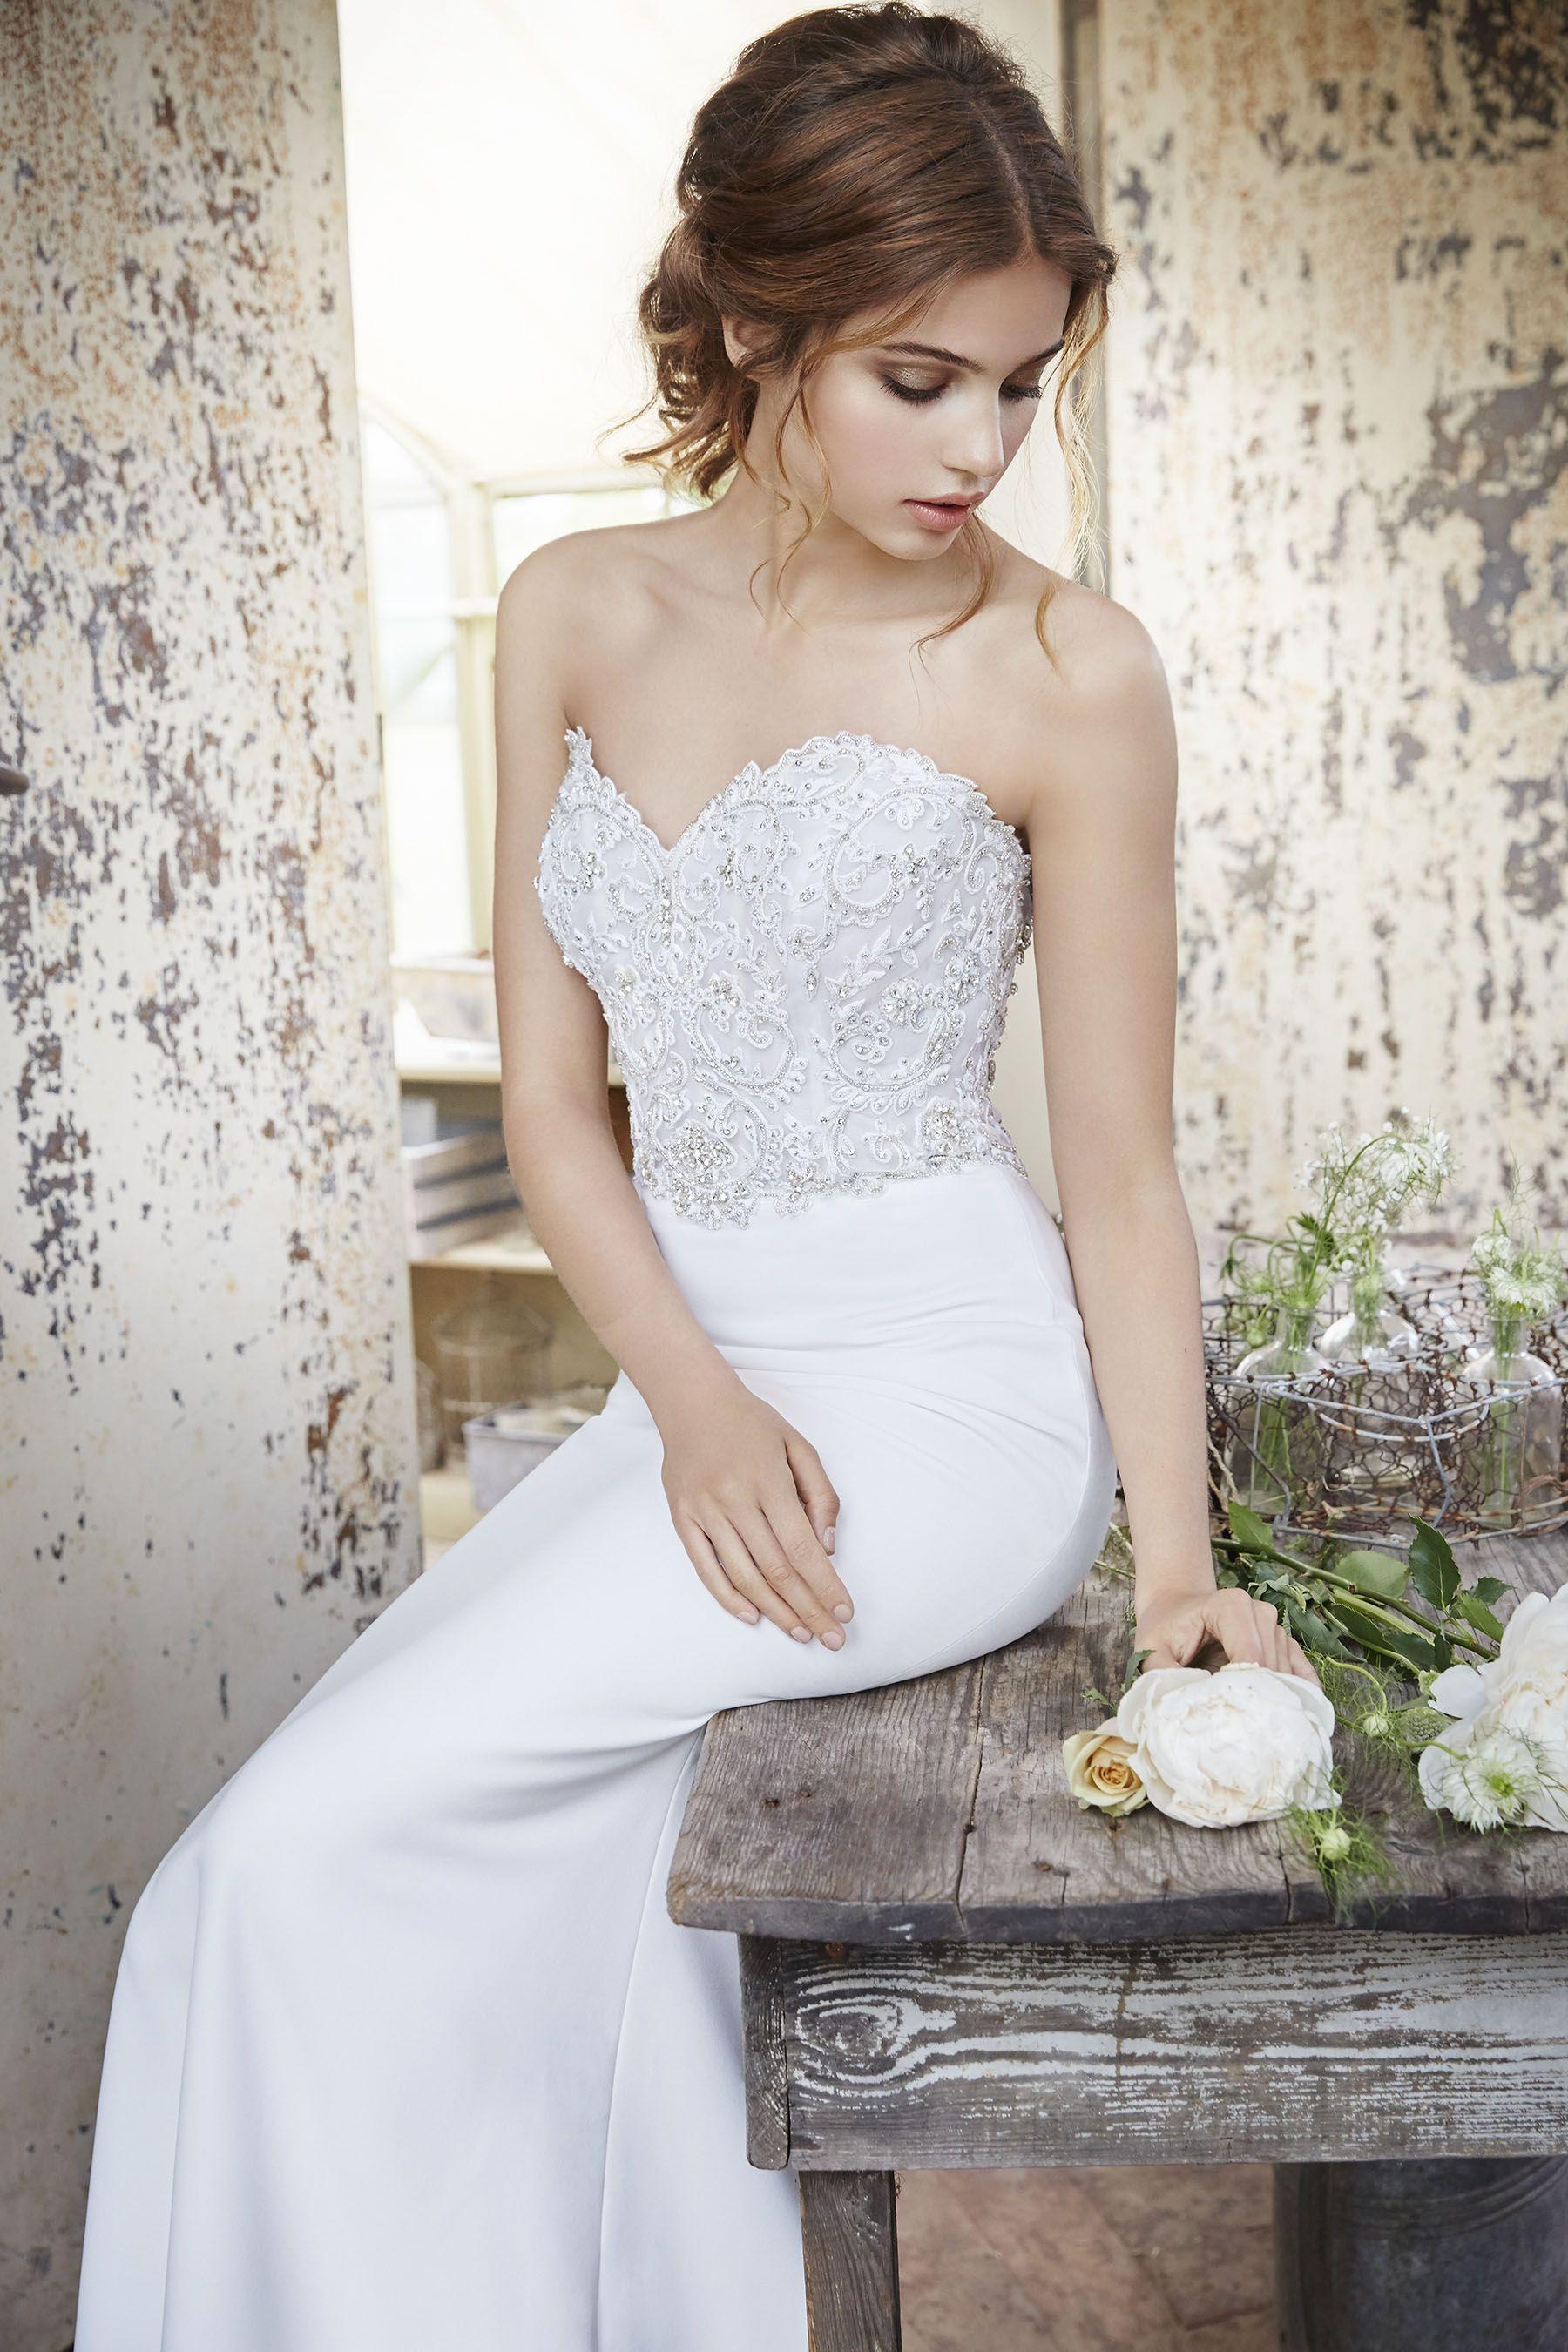 Bridal Gowns Wedding Dresses By Tara Keely Style 2655 Diamond